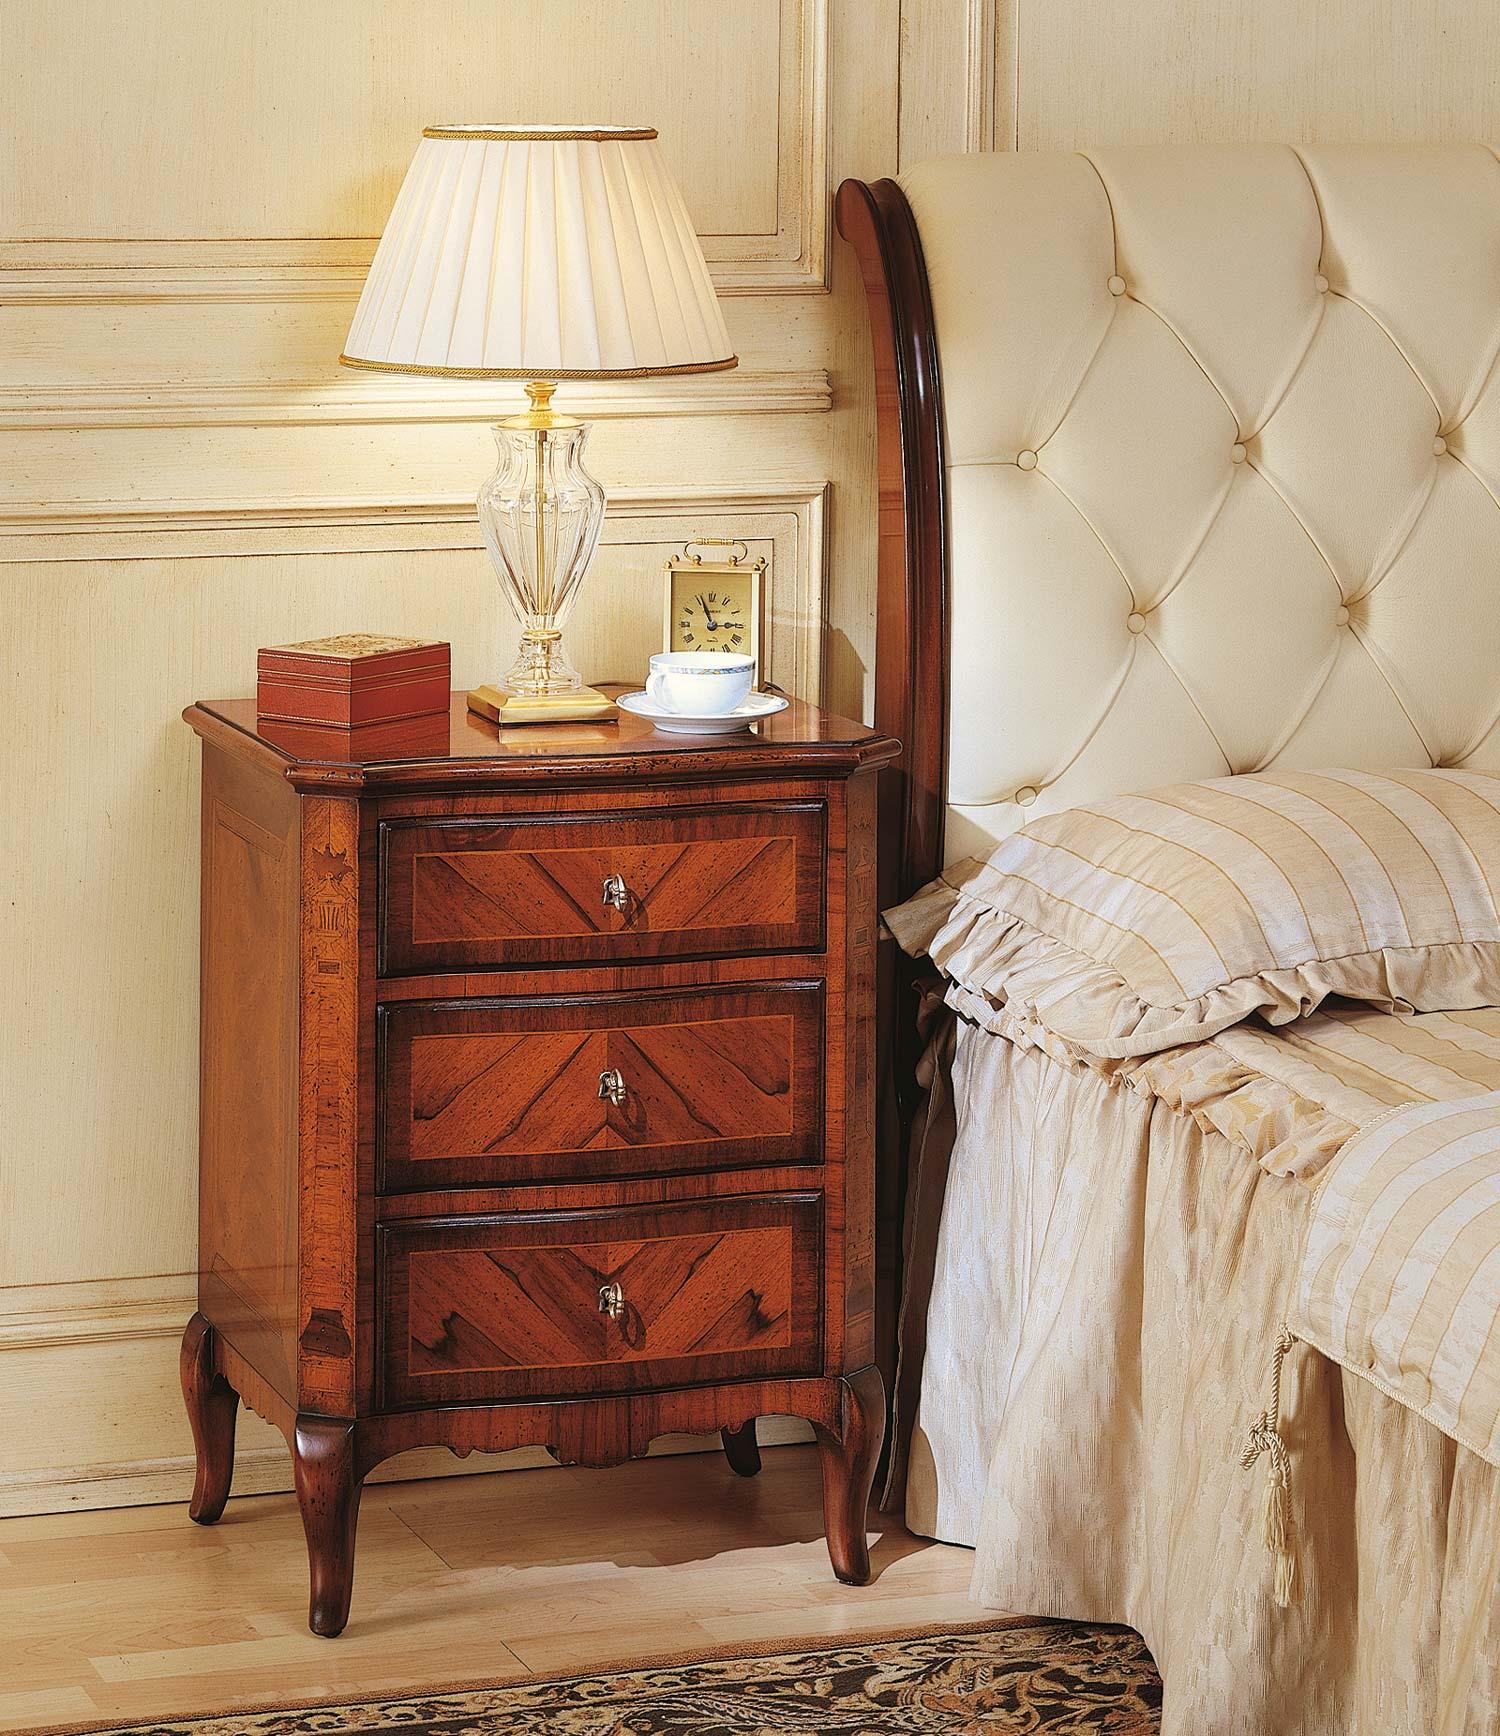 Camera da letto 800 francese, comodino in noce  Vimercati Meda